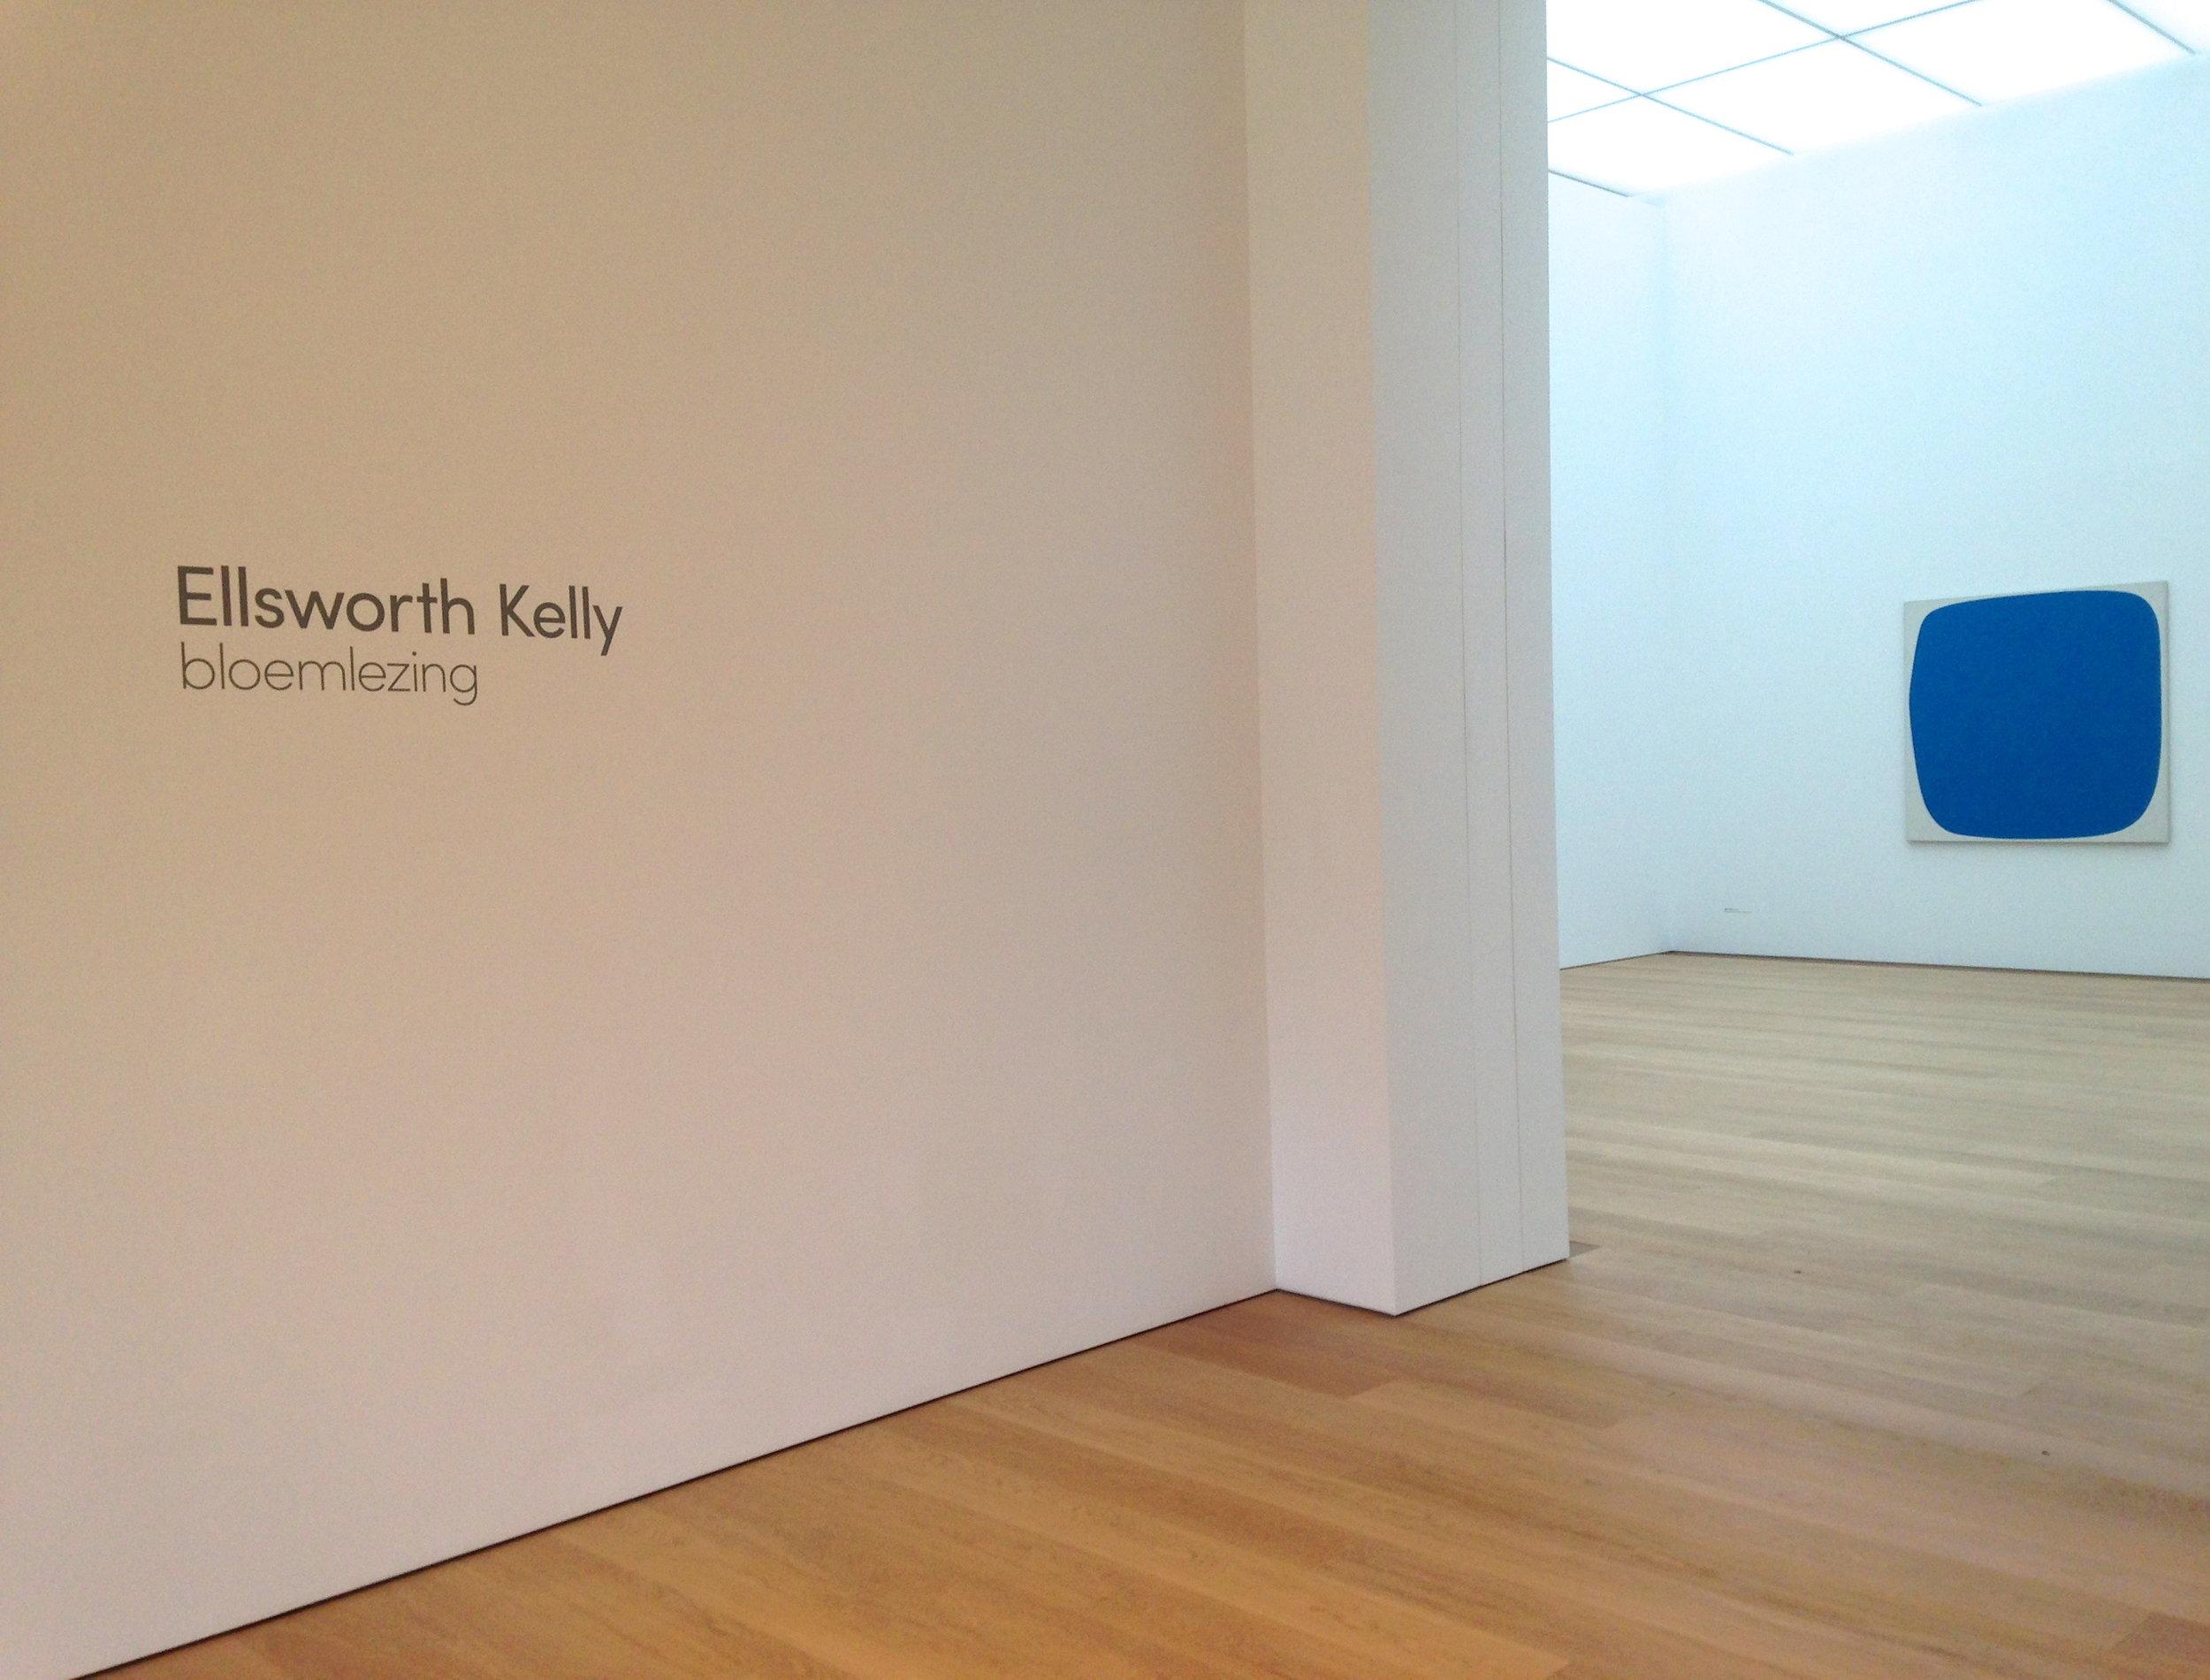 Ellsworth Kelly,  Blue Ripe  (1959)